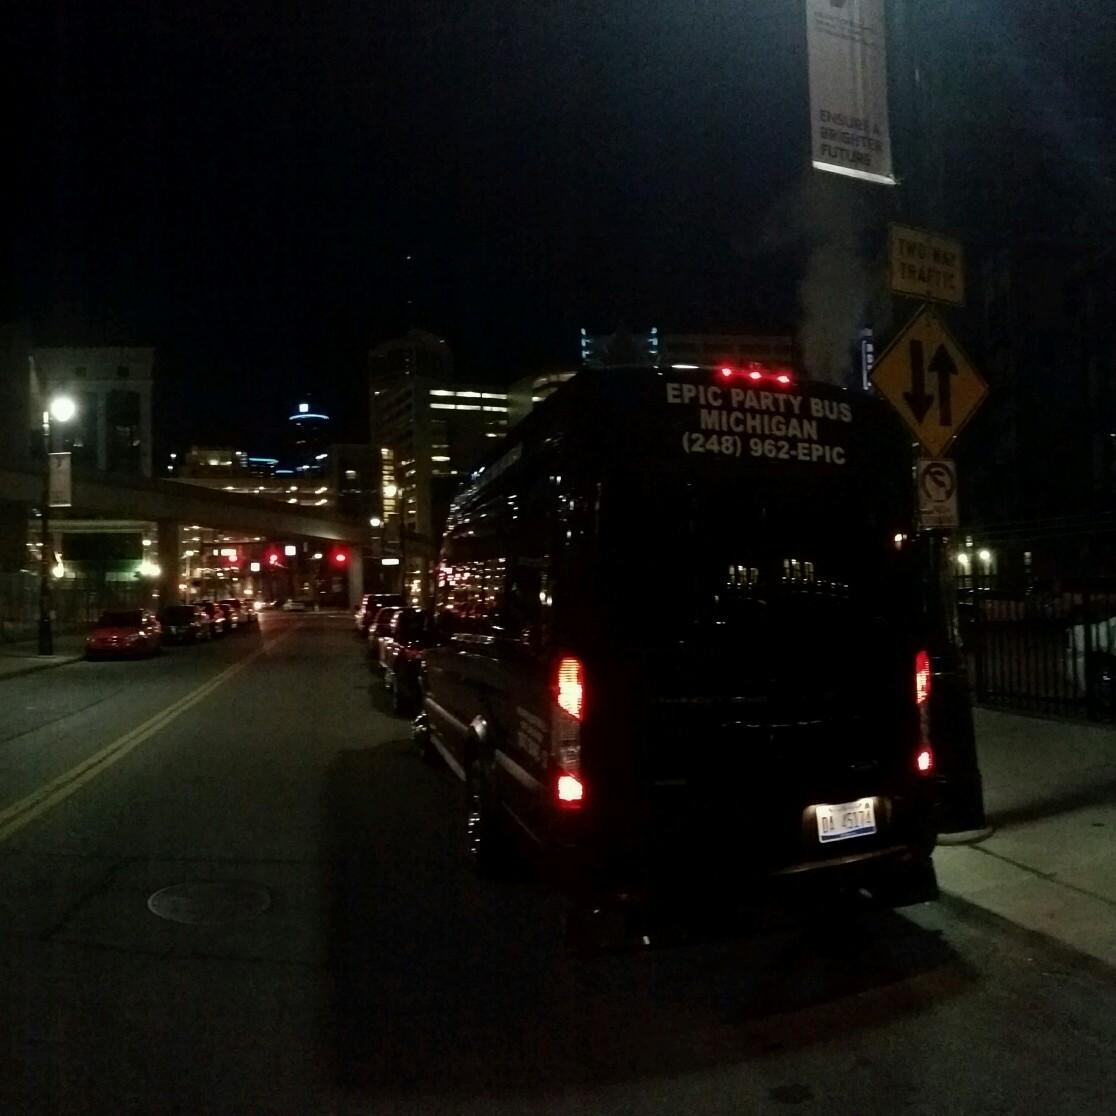 Epic Party Bus Michigan